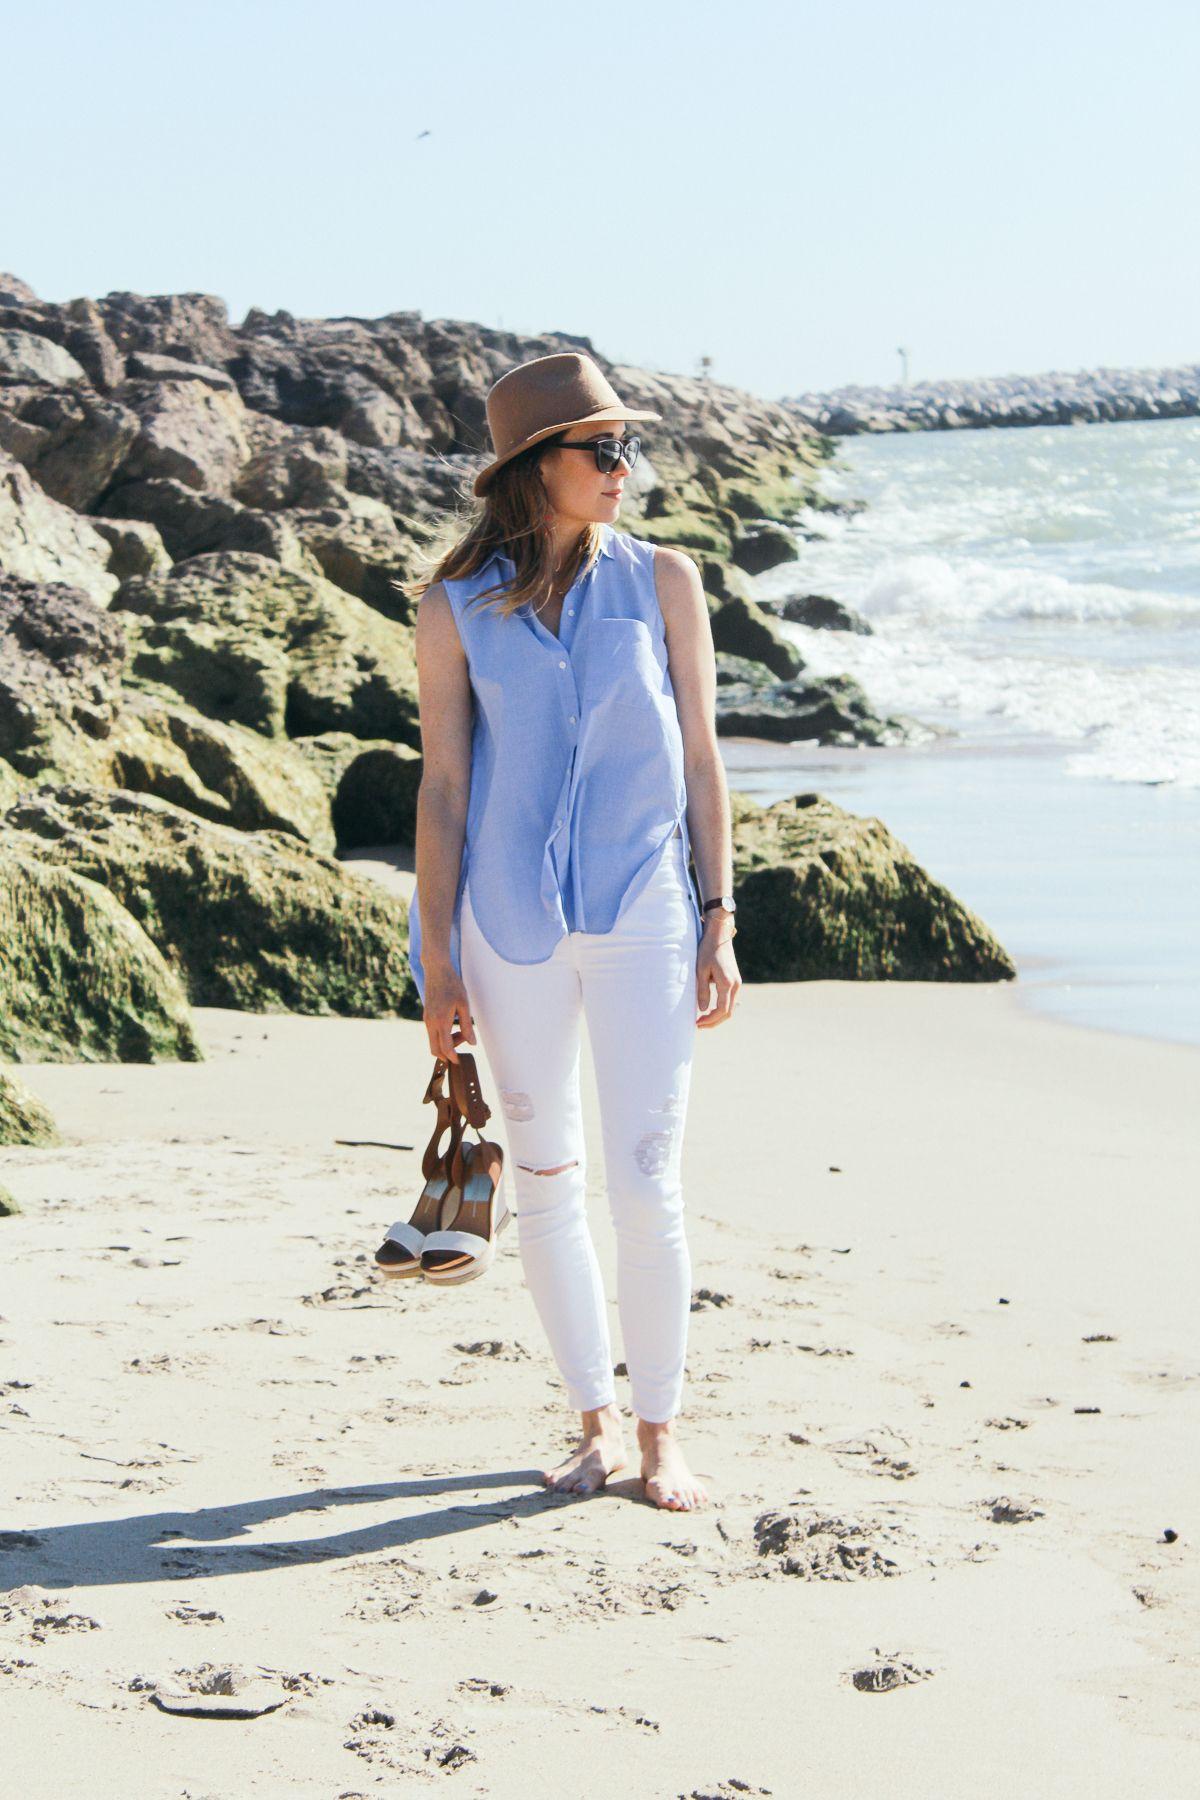 08199182fd spring style, summer style, resort style, distressed white denim, platform  sandals, fringe earrings, nude felt hat